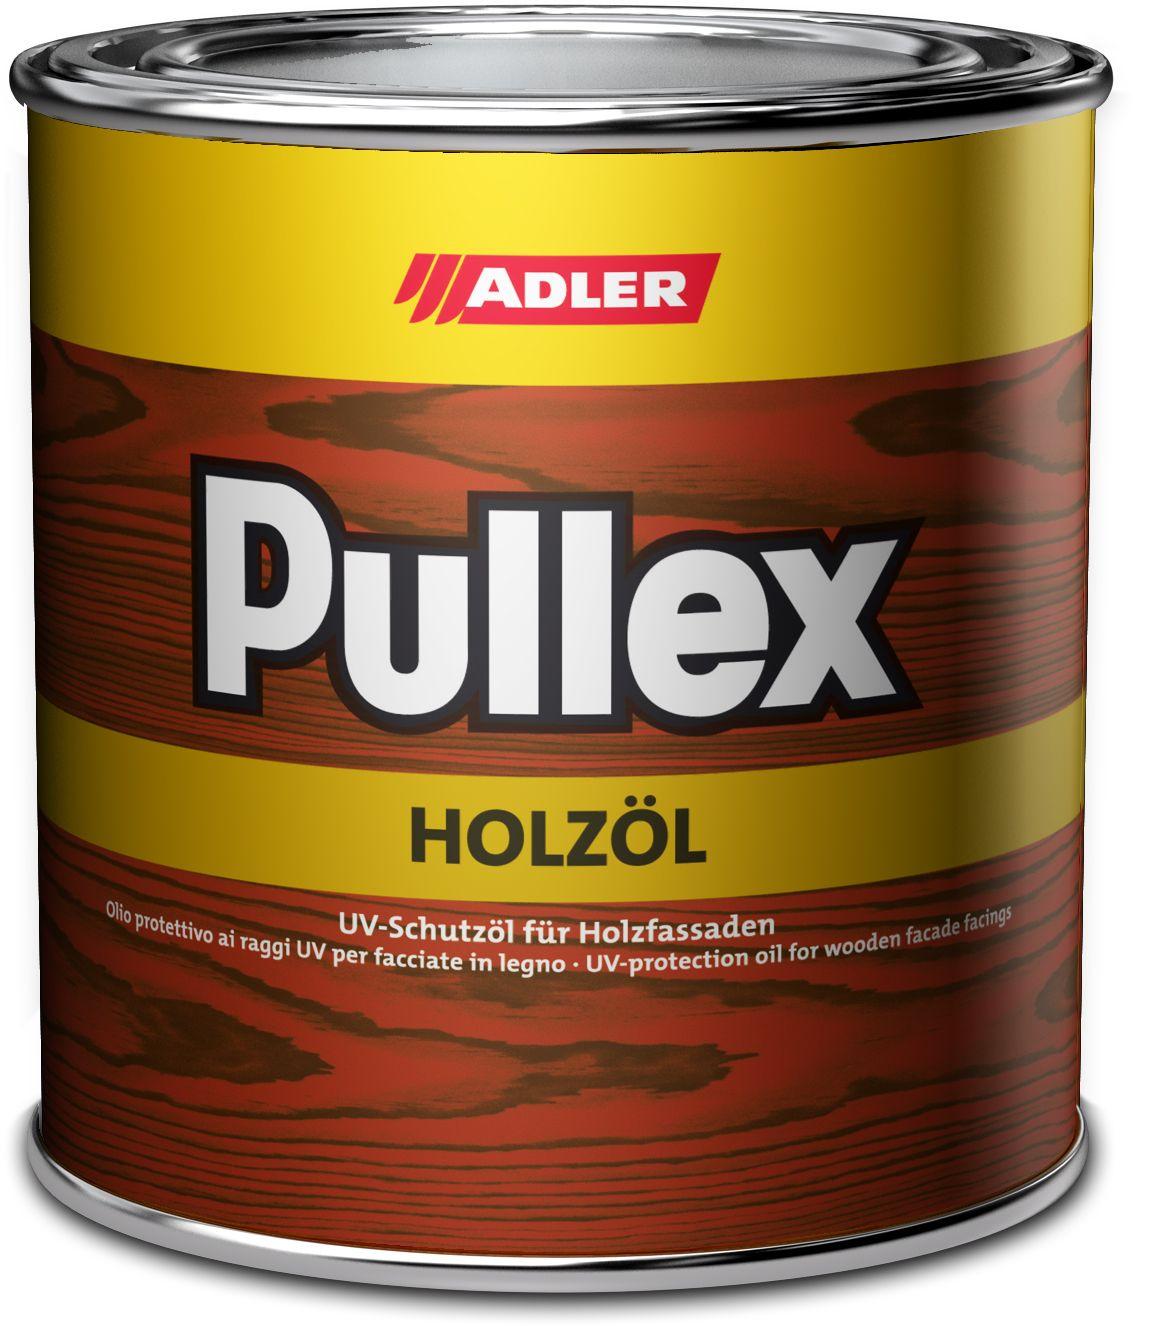 Adler Pullex Holzöl Dose illustriert